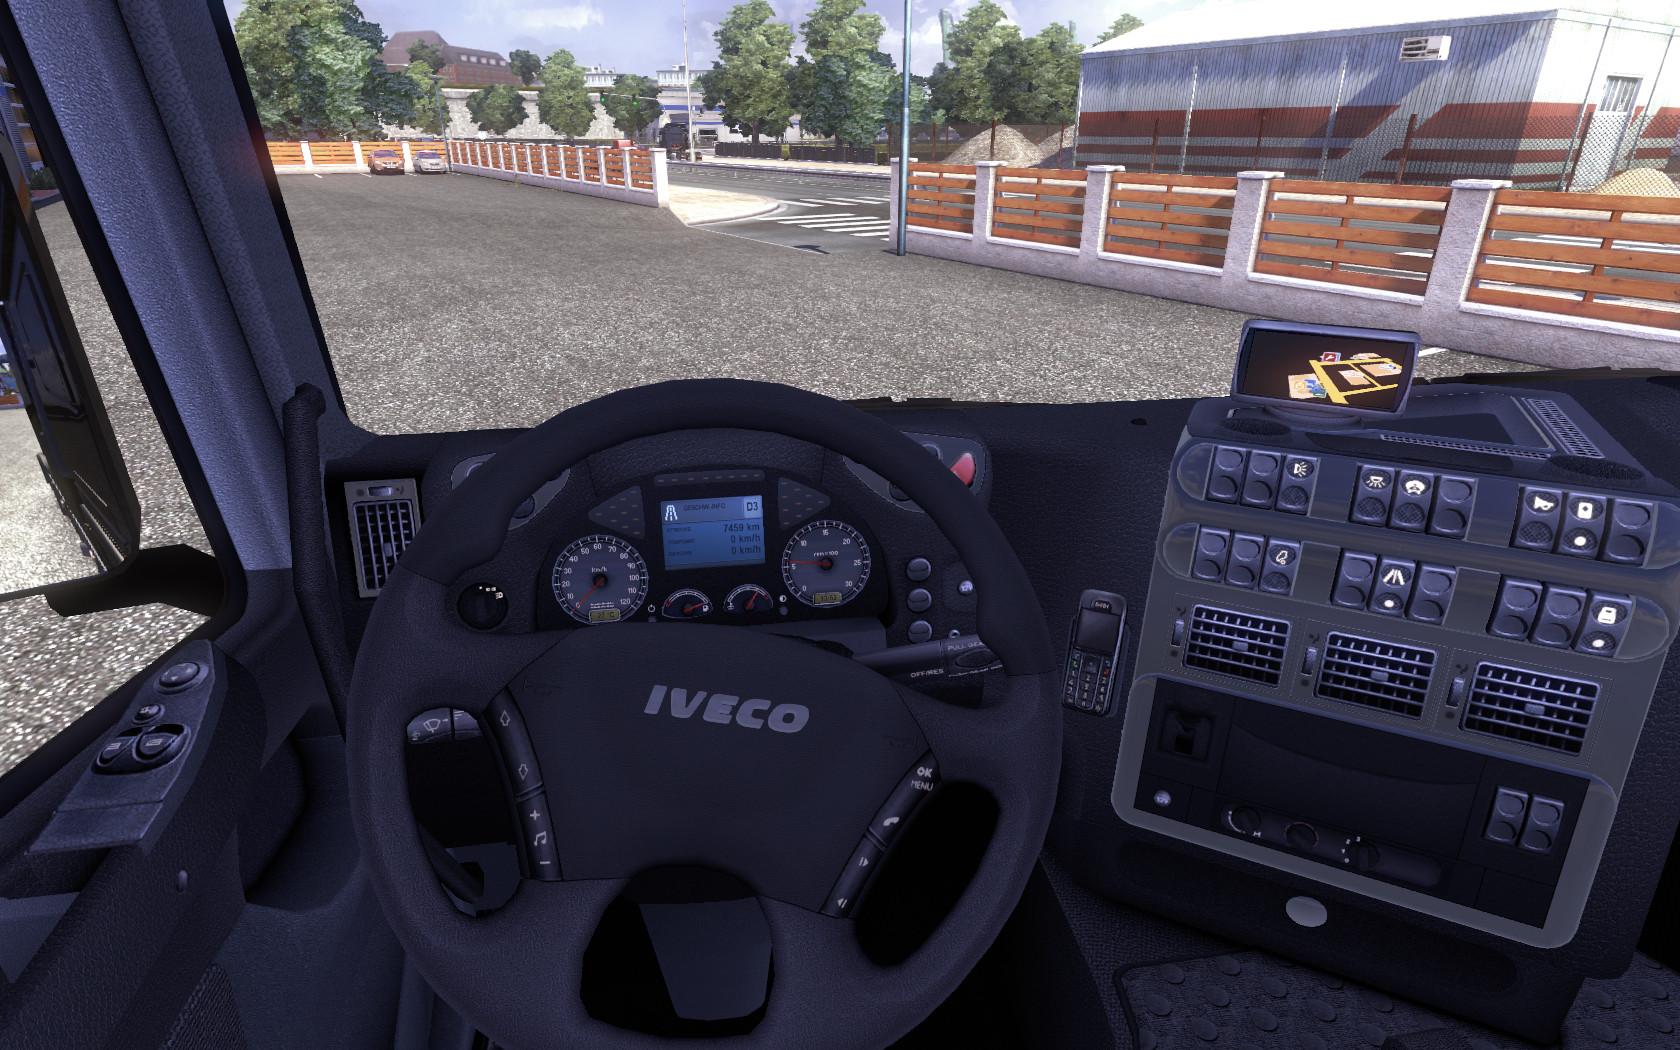 [Sammelthread] Euro Truck Simulator 2 [Reifenupdate + Reale Reifen DLC geteasert]-ets2_00144.jpg